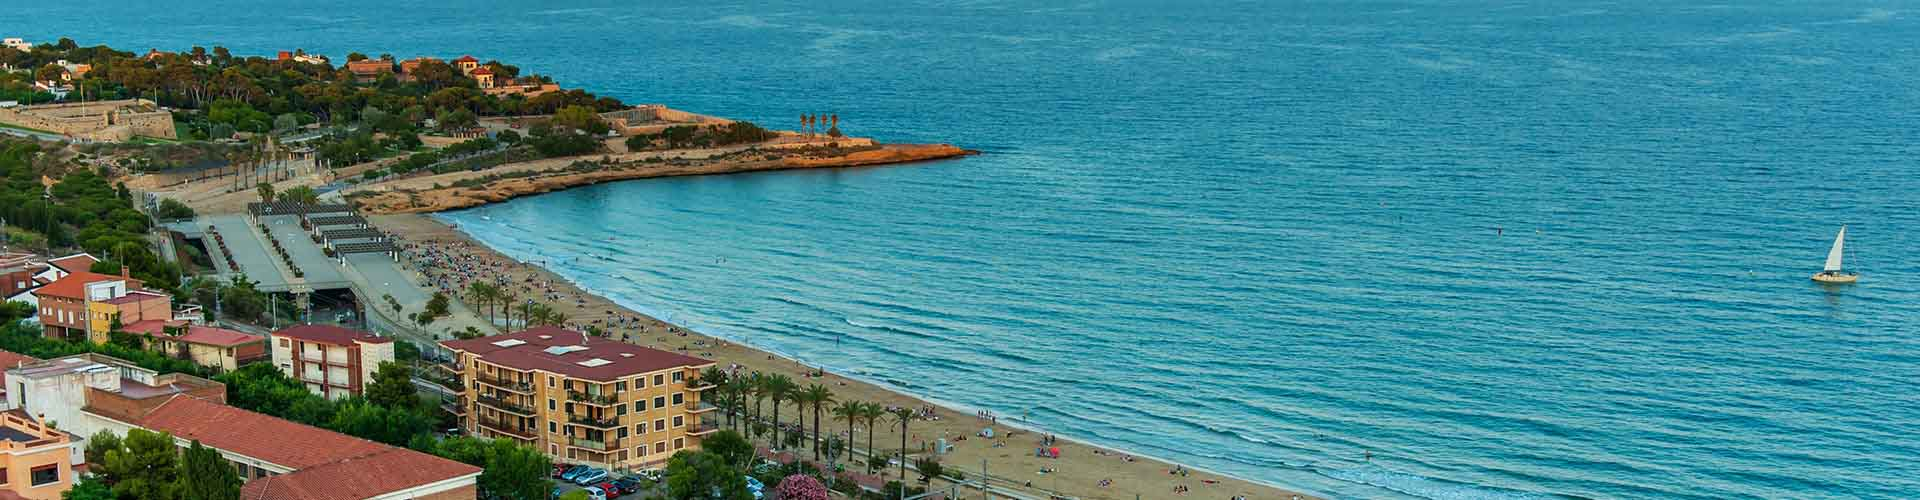 Tarragona - Hôtels à Tarragona. Cartes pour Tarragona, photos et commentaires pour chaque hôtel à Tarragona.